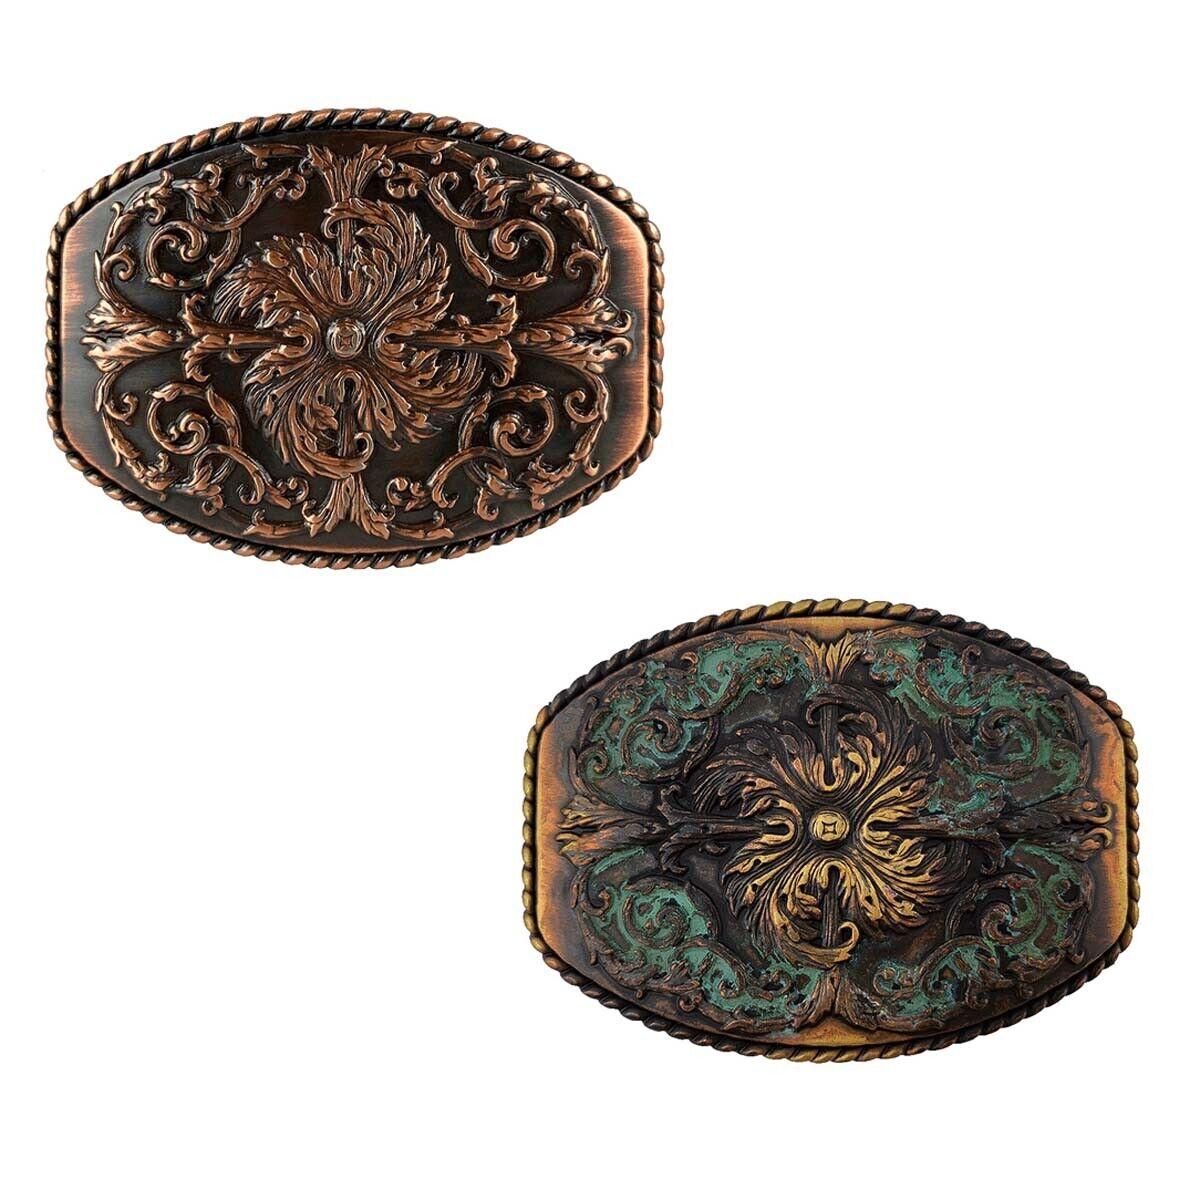 Western Celtic Buckle Cowboy Cowgirl Engraved Belt Buckle fits 1-1/2